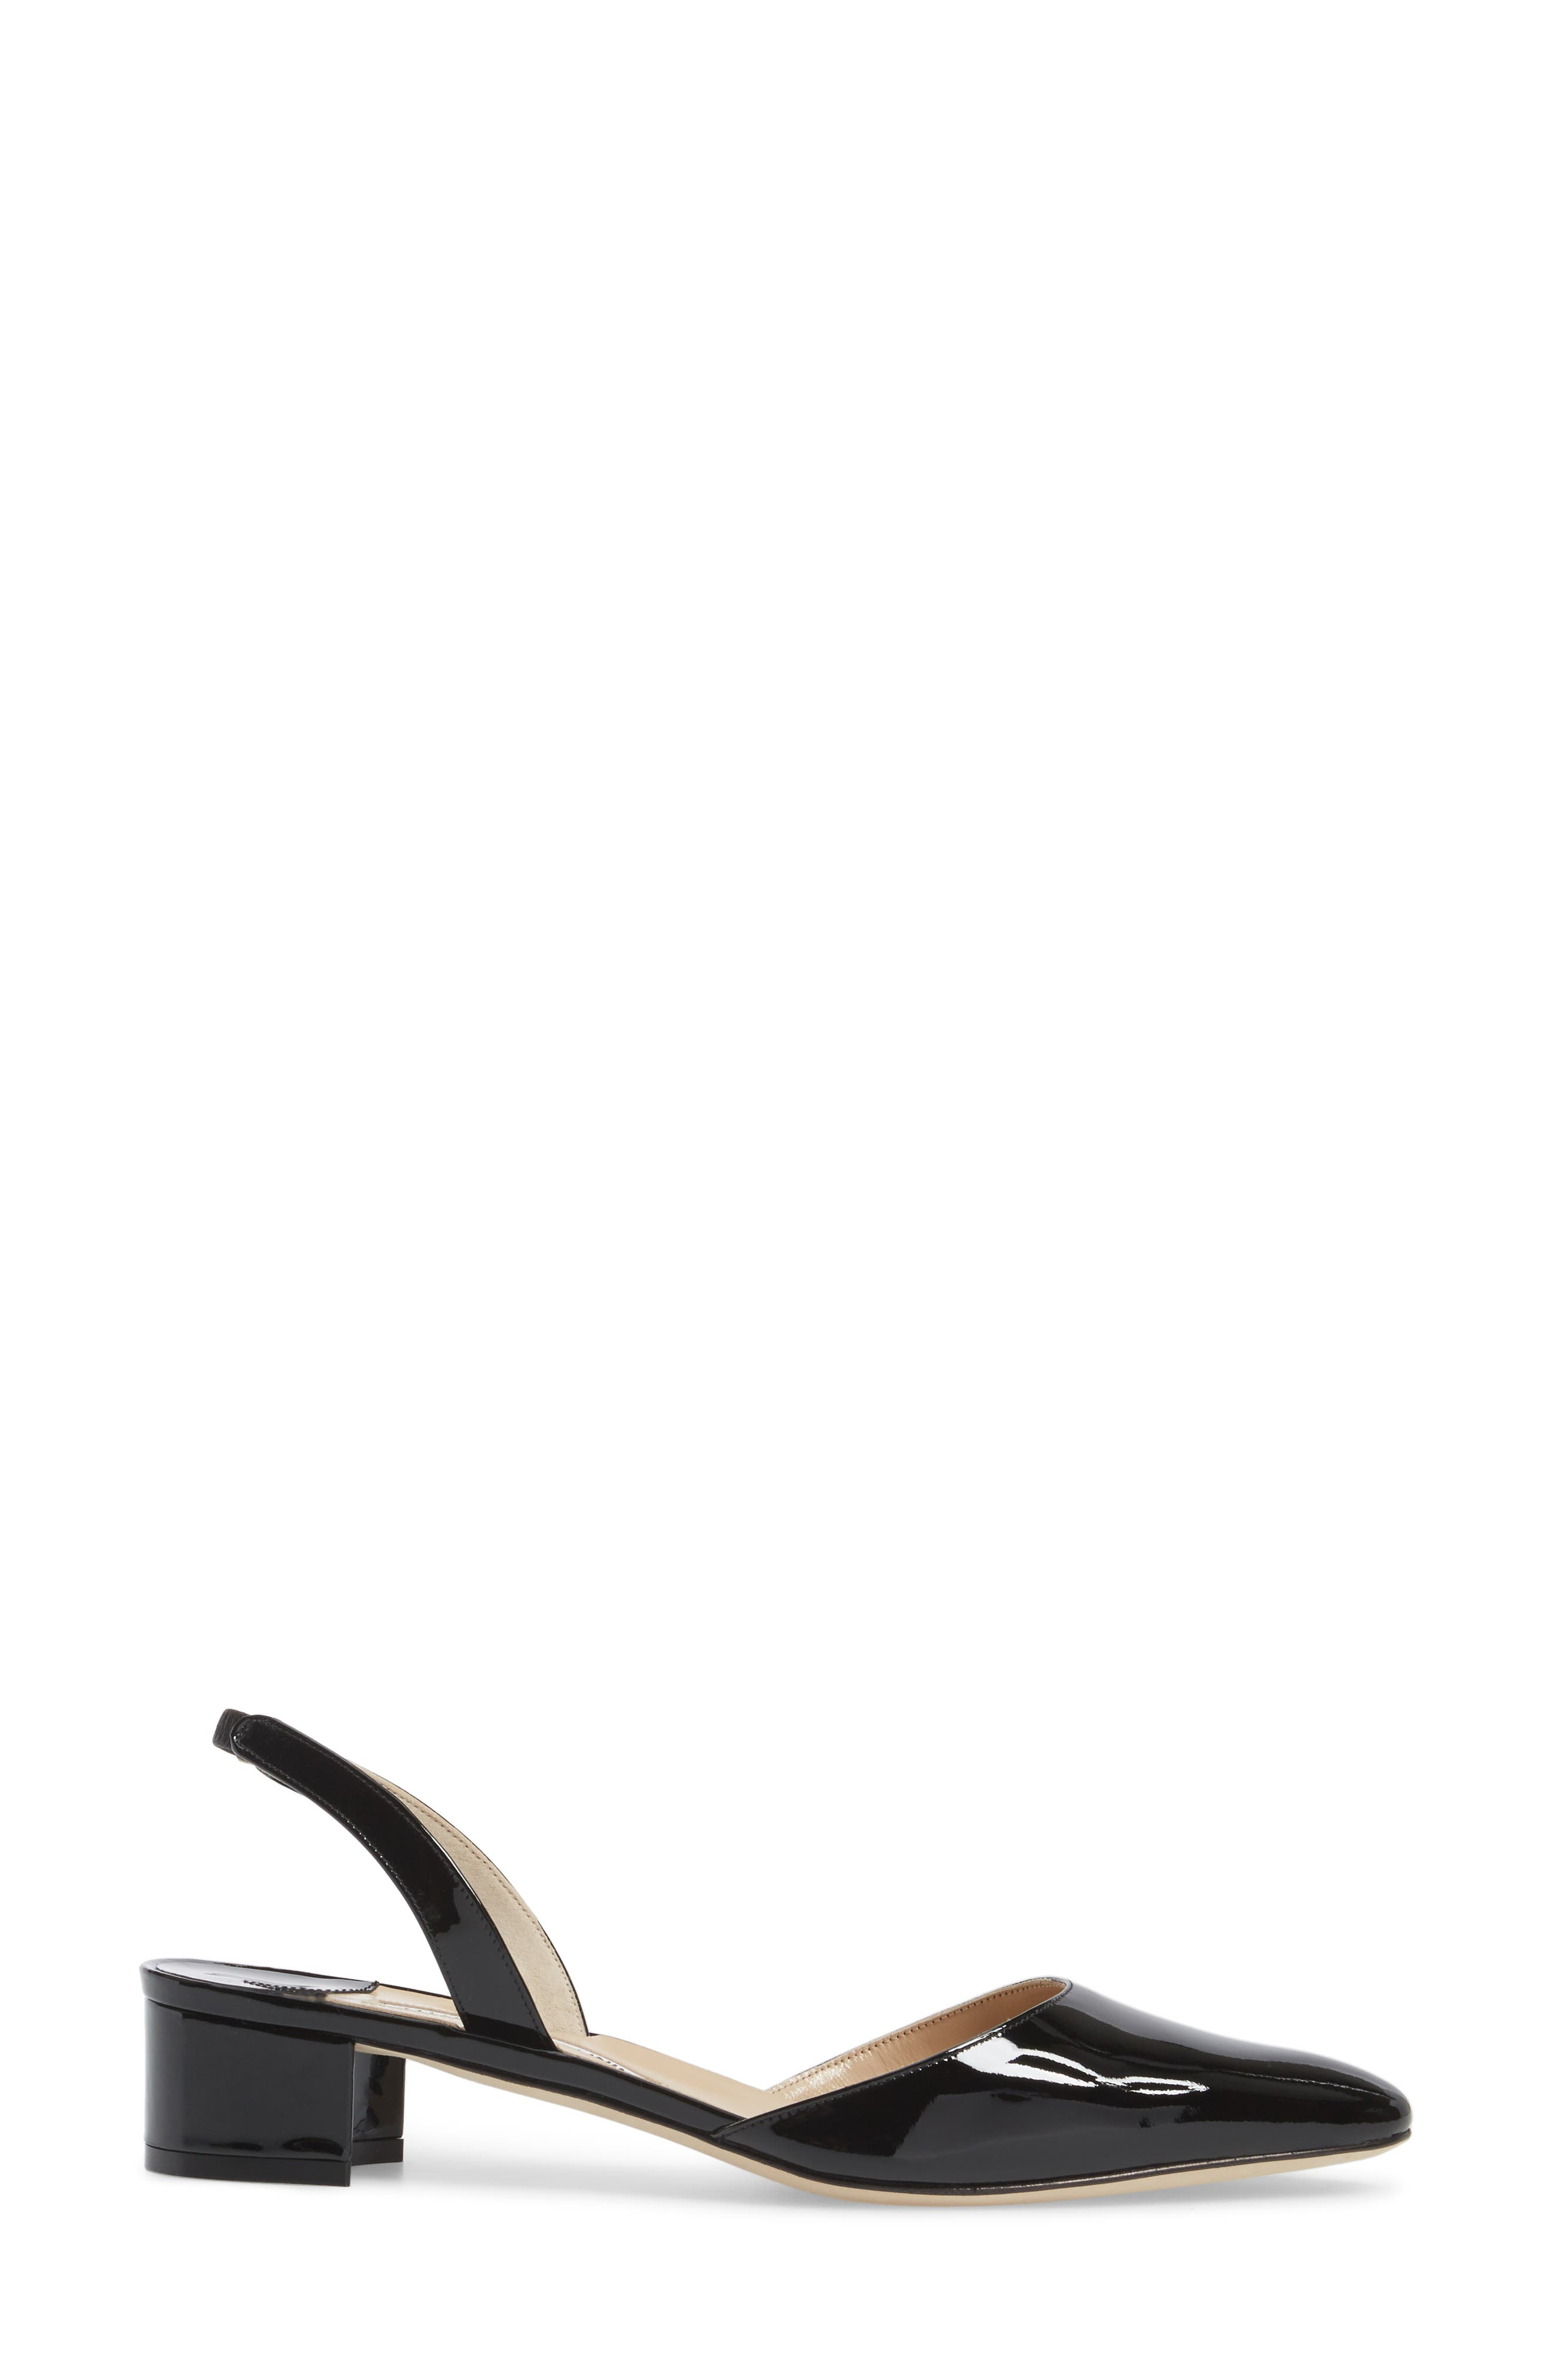 Alternate Image 3  - Manolo Blahnik Aspro Block Heel Pump (Women)